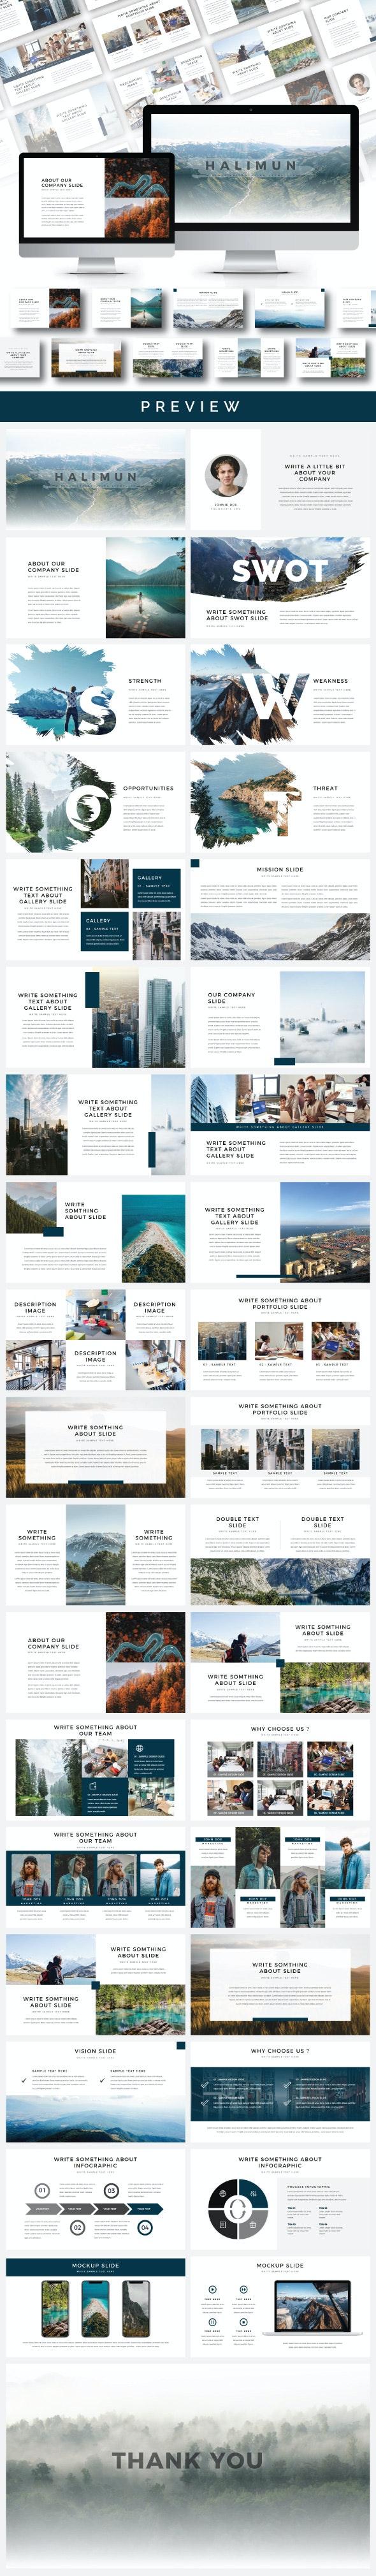 Halimun Presentation Templates - Business PowerPoint Templates